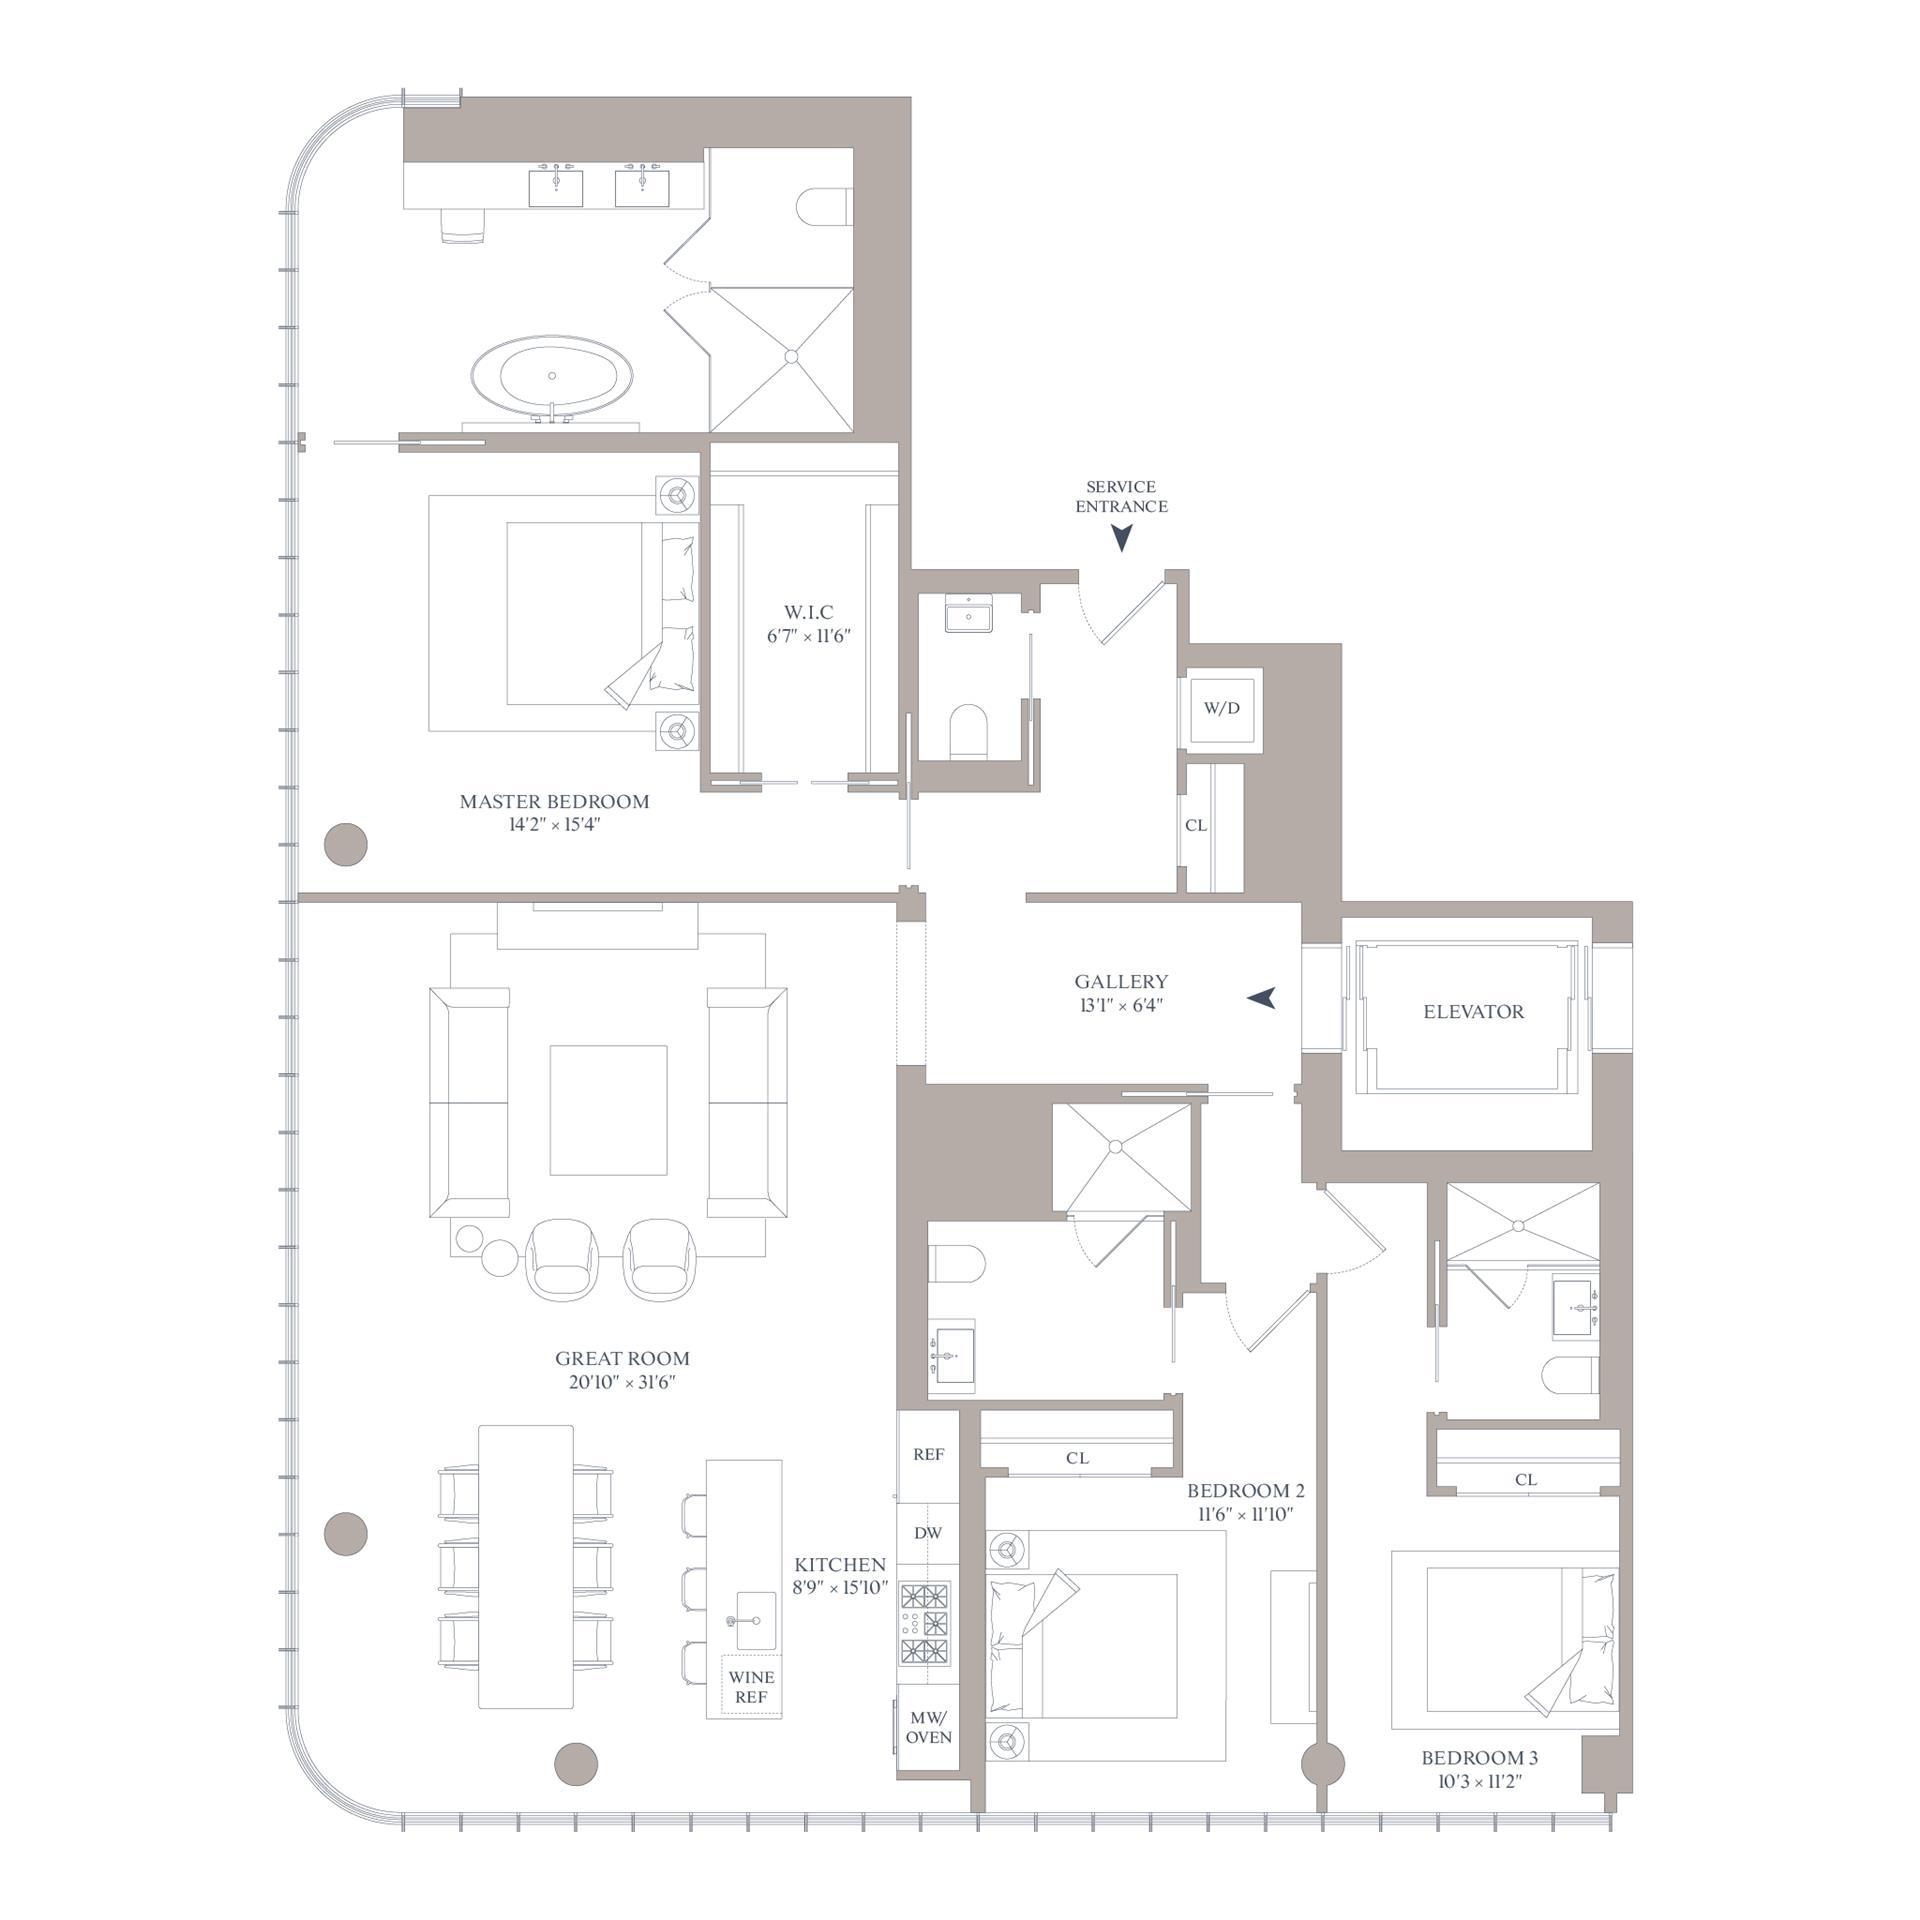 Floor plan of 565 Broome Street, S26A - SoHo - Nolita, New York